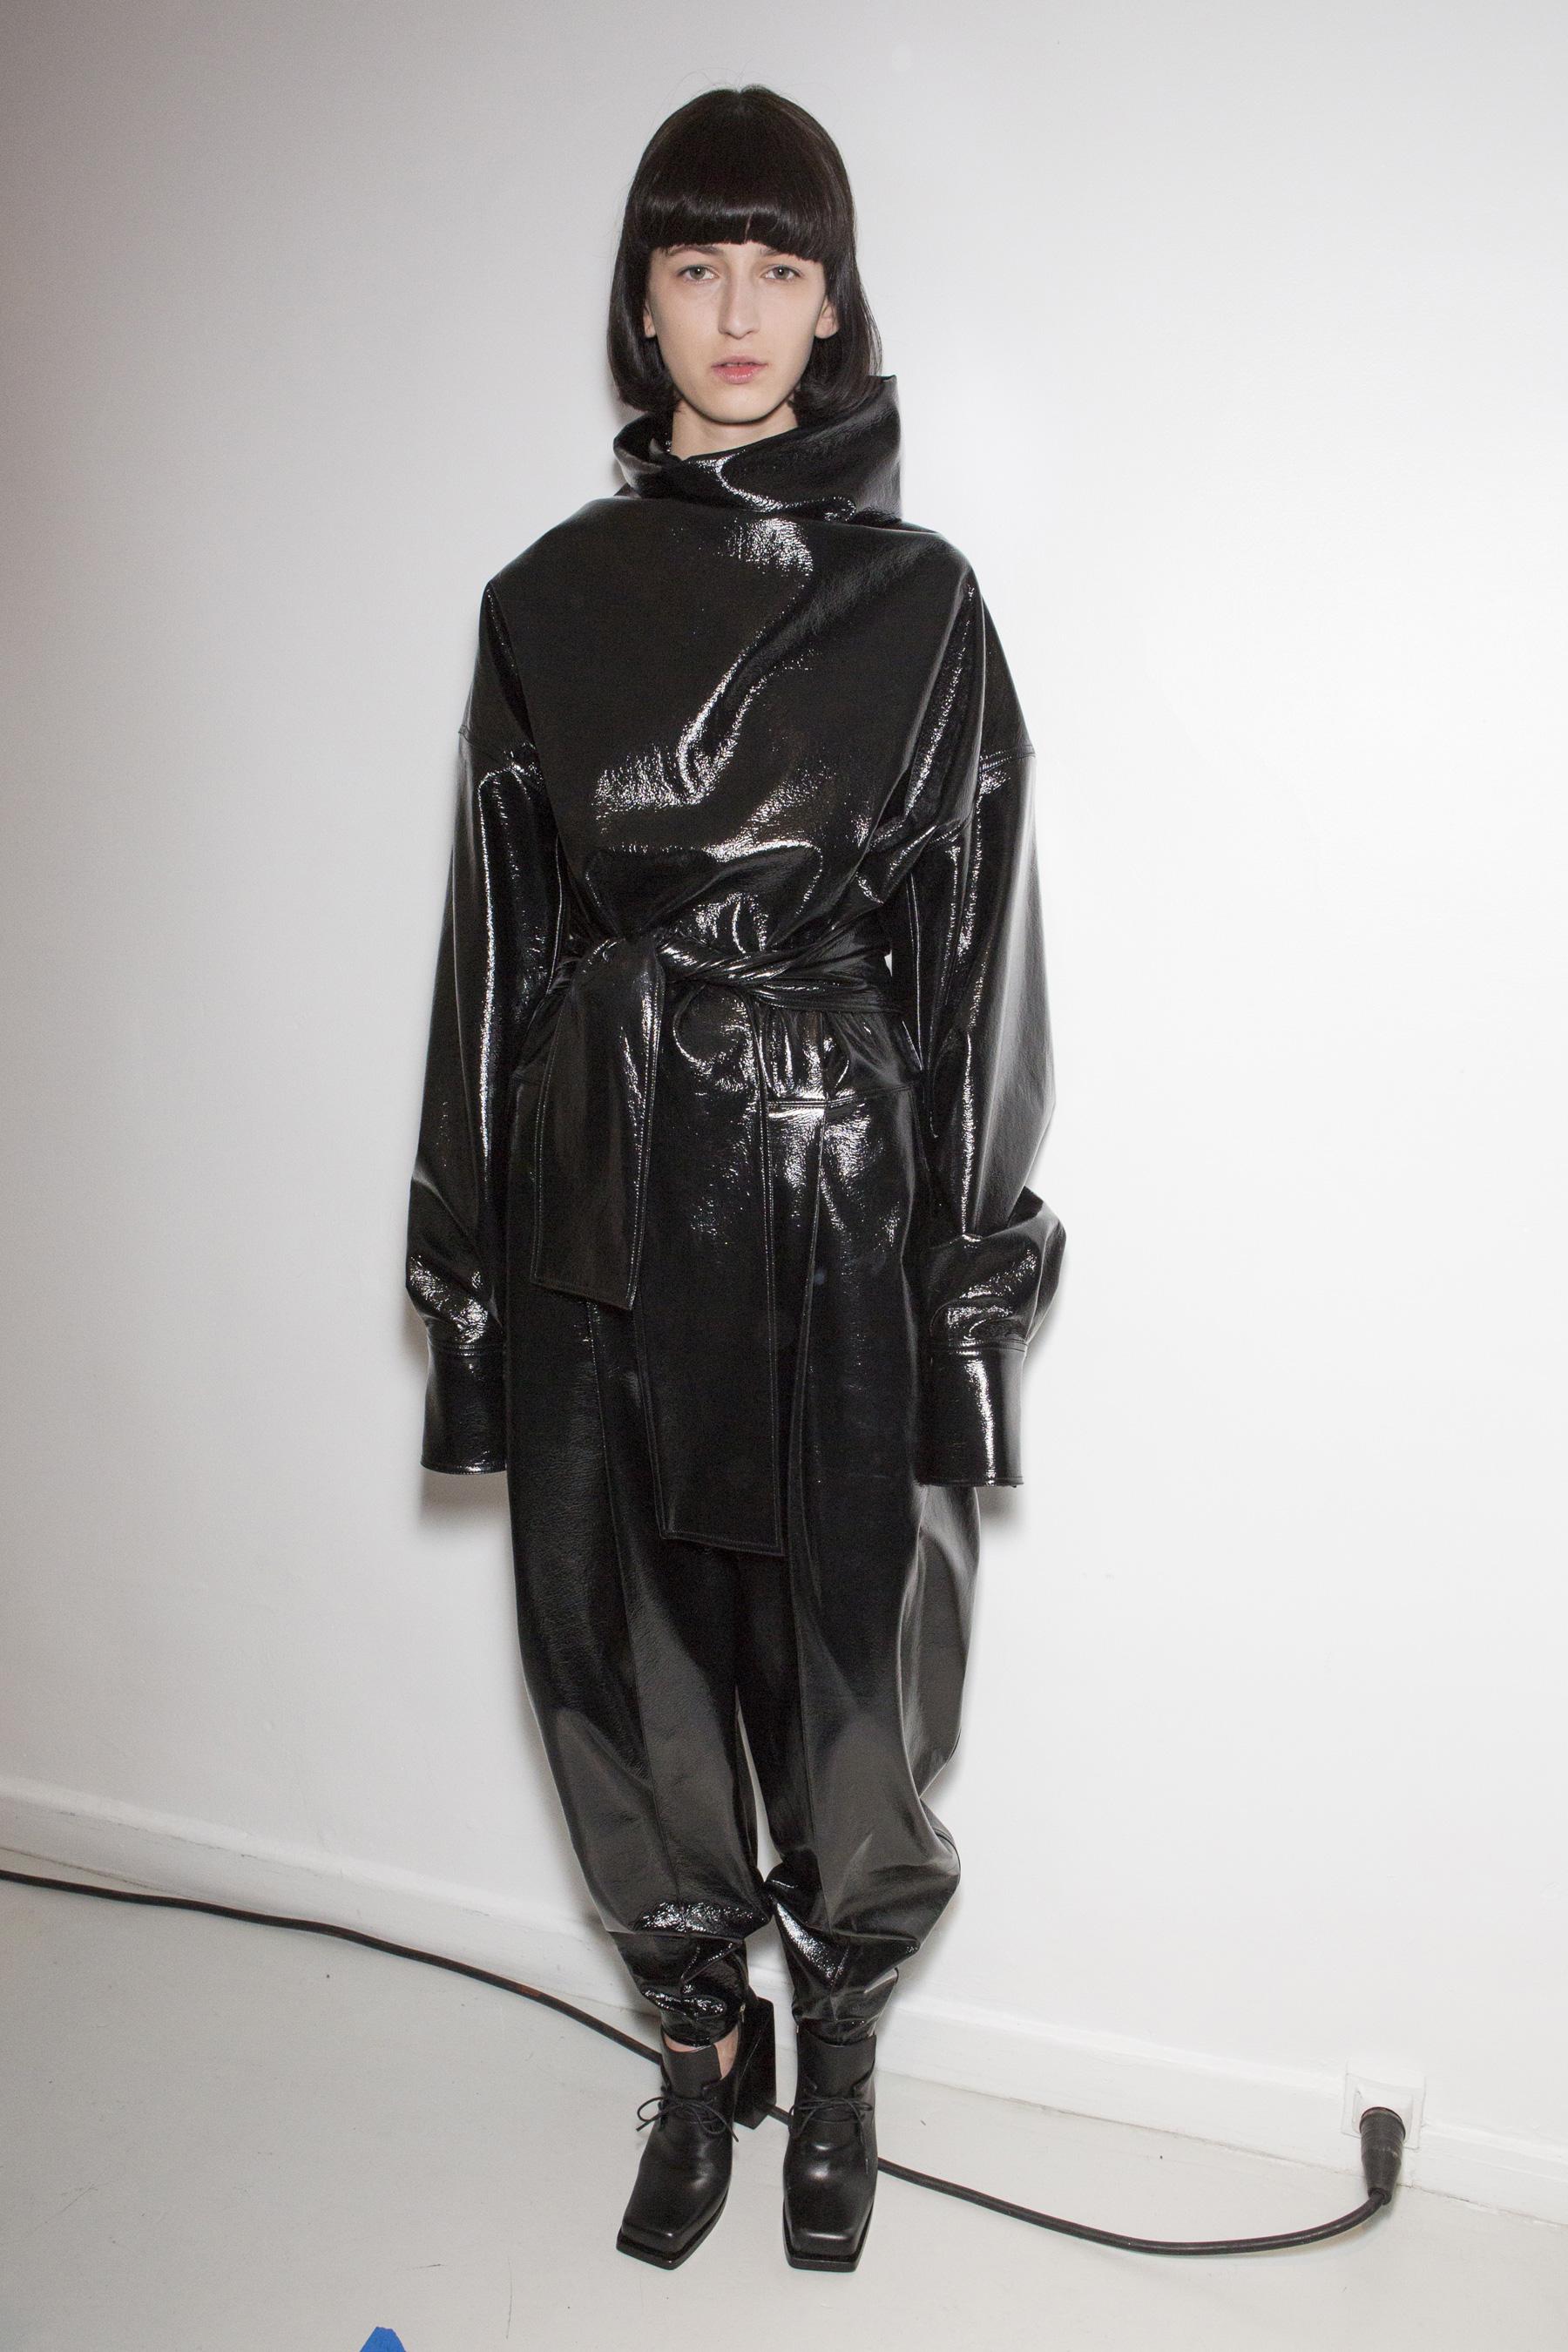 Wanda Nylon bks Z RF17 5154